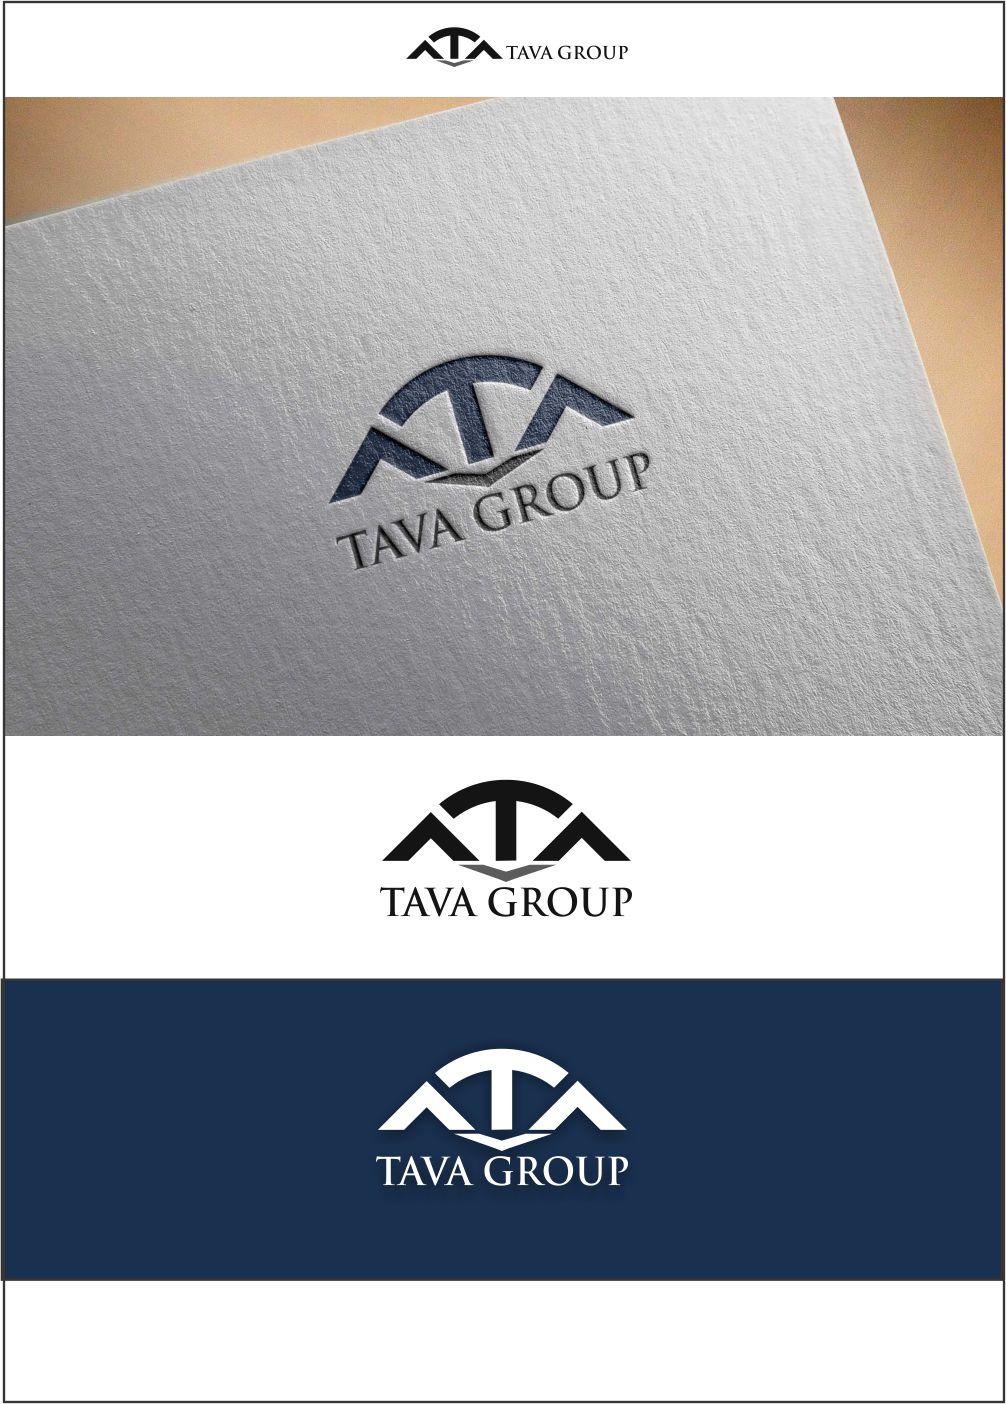 Logo Design by ian69 - Entry No. 202 in the Logo Design Contest Creative Logo Design for Tava Group.